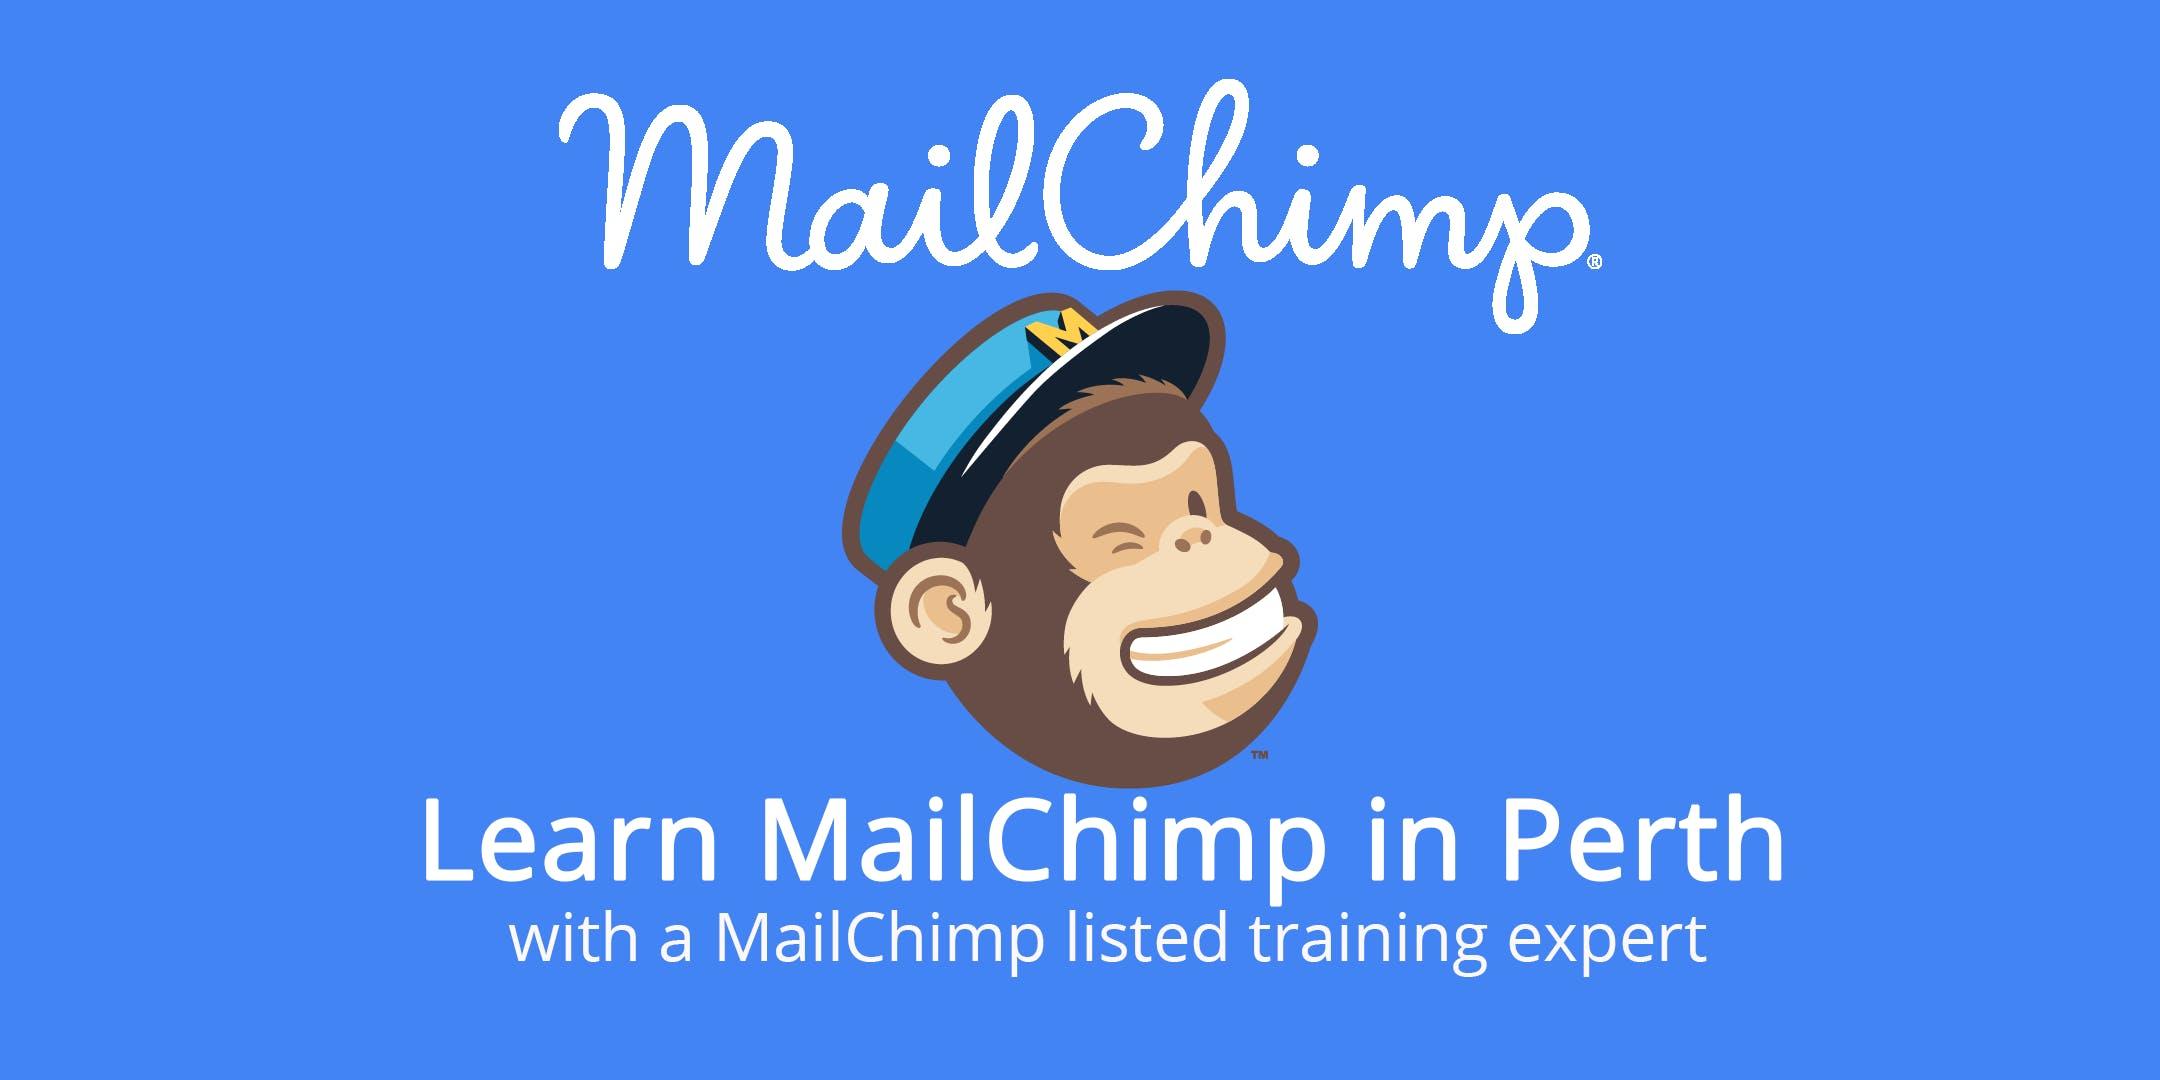 Learn MailChimp in Perth